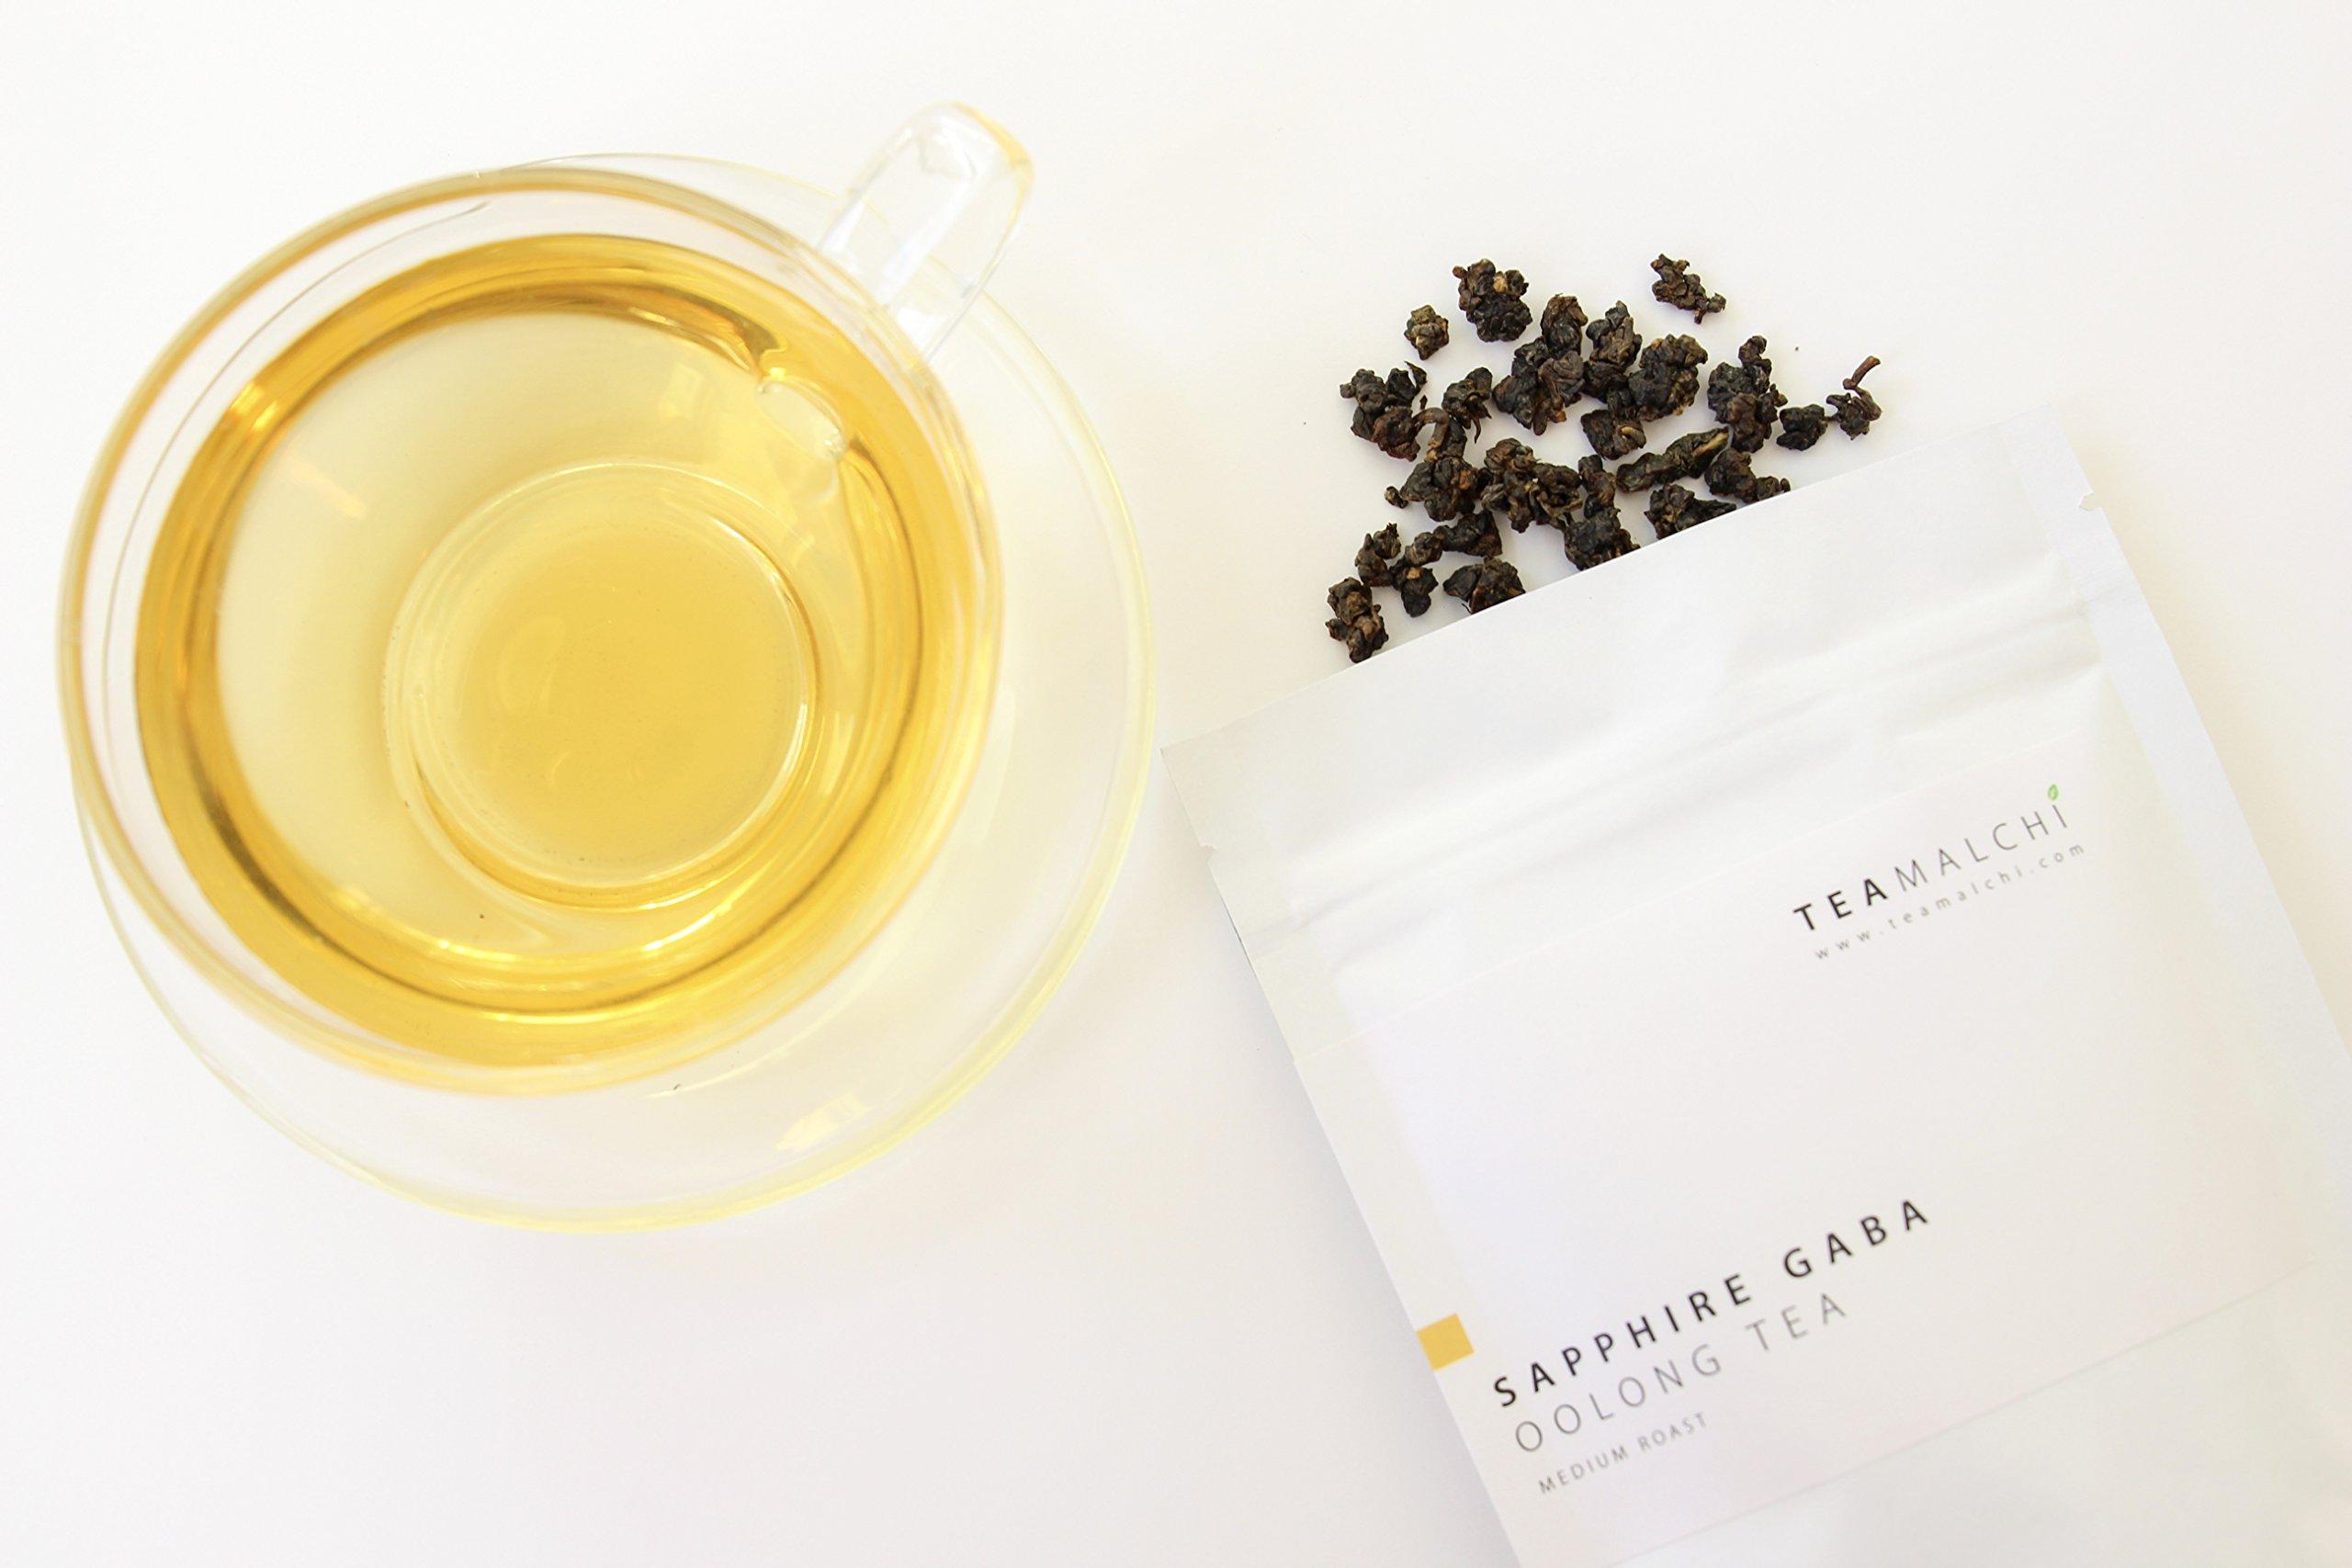 Natural Taiwan High Mountain Sapphire GABA Loose Leaf Oolong Tea, 50g/1.76 oz by TEAMALCHI (Image #7)